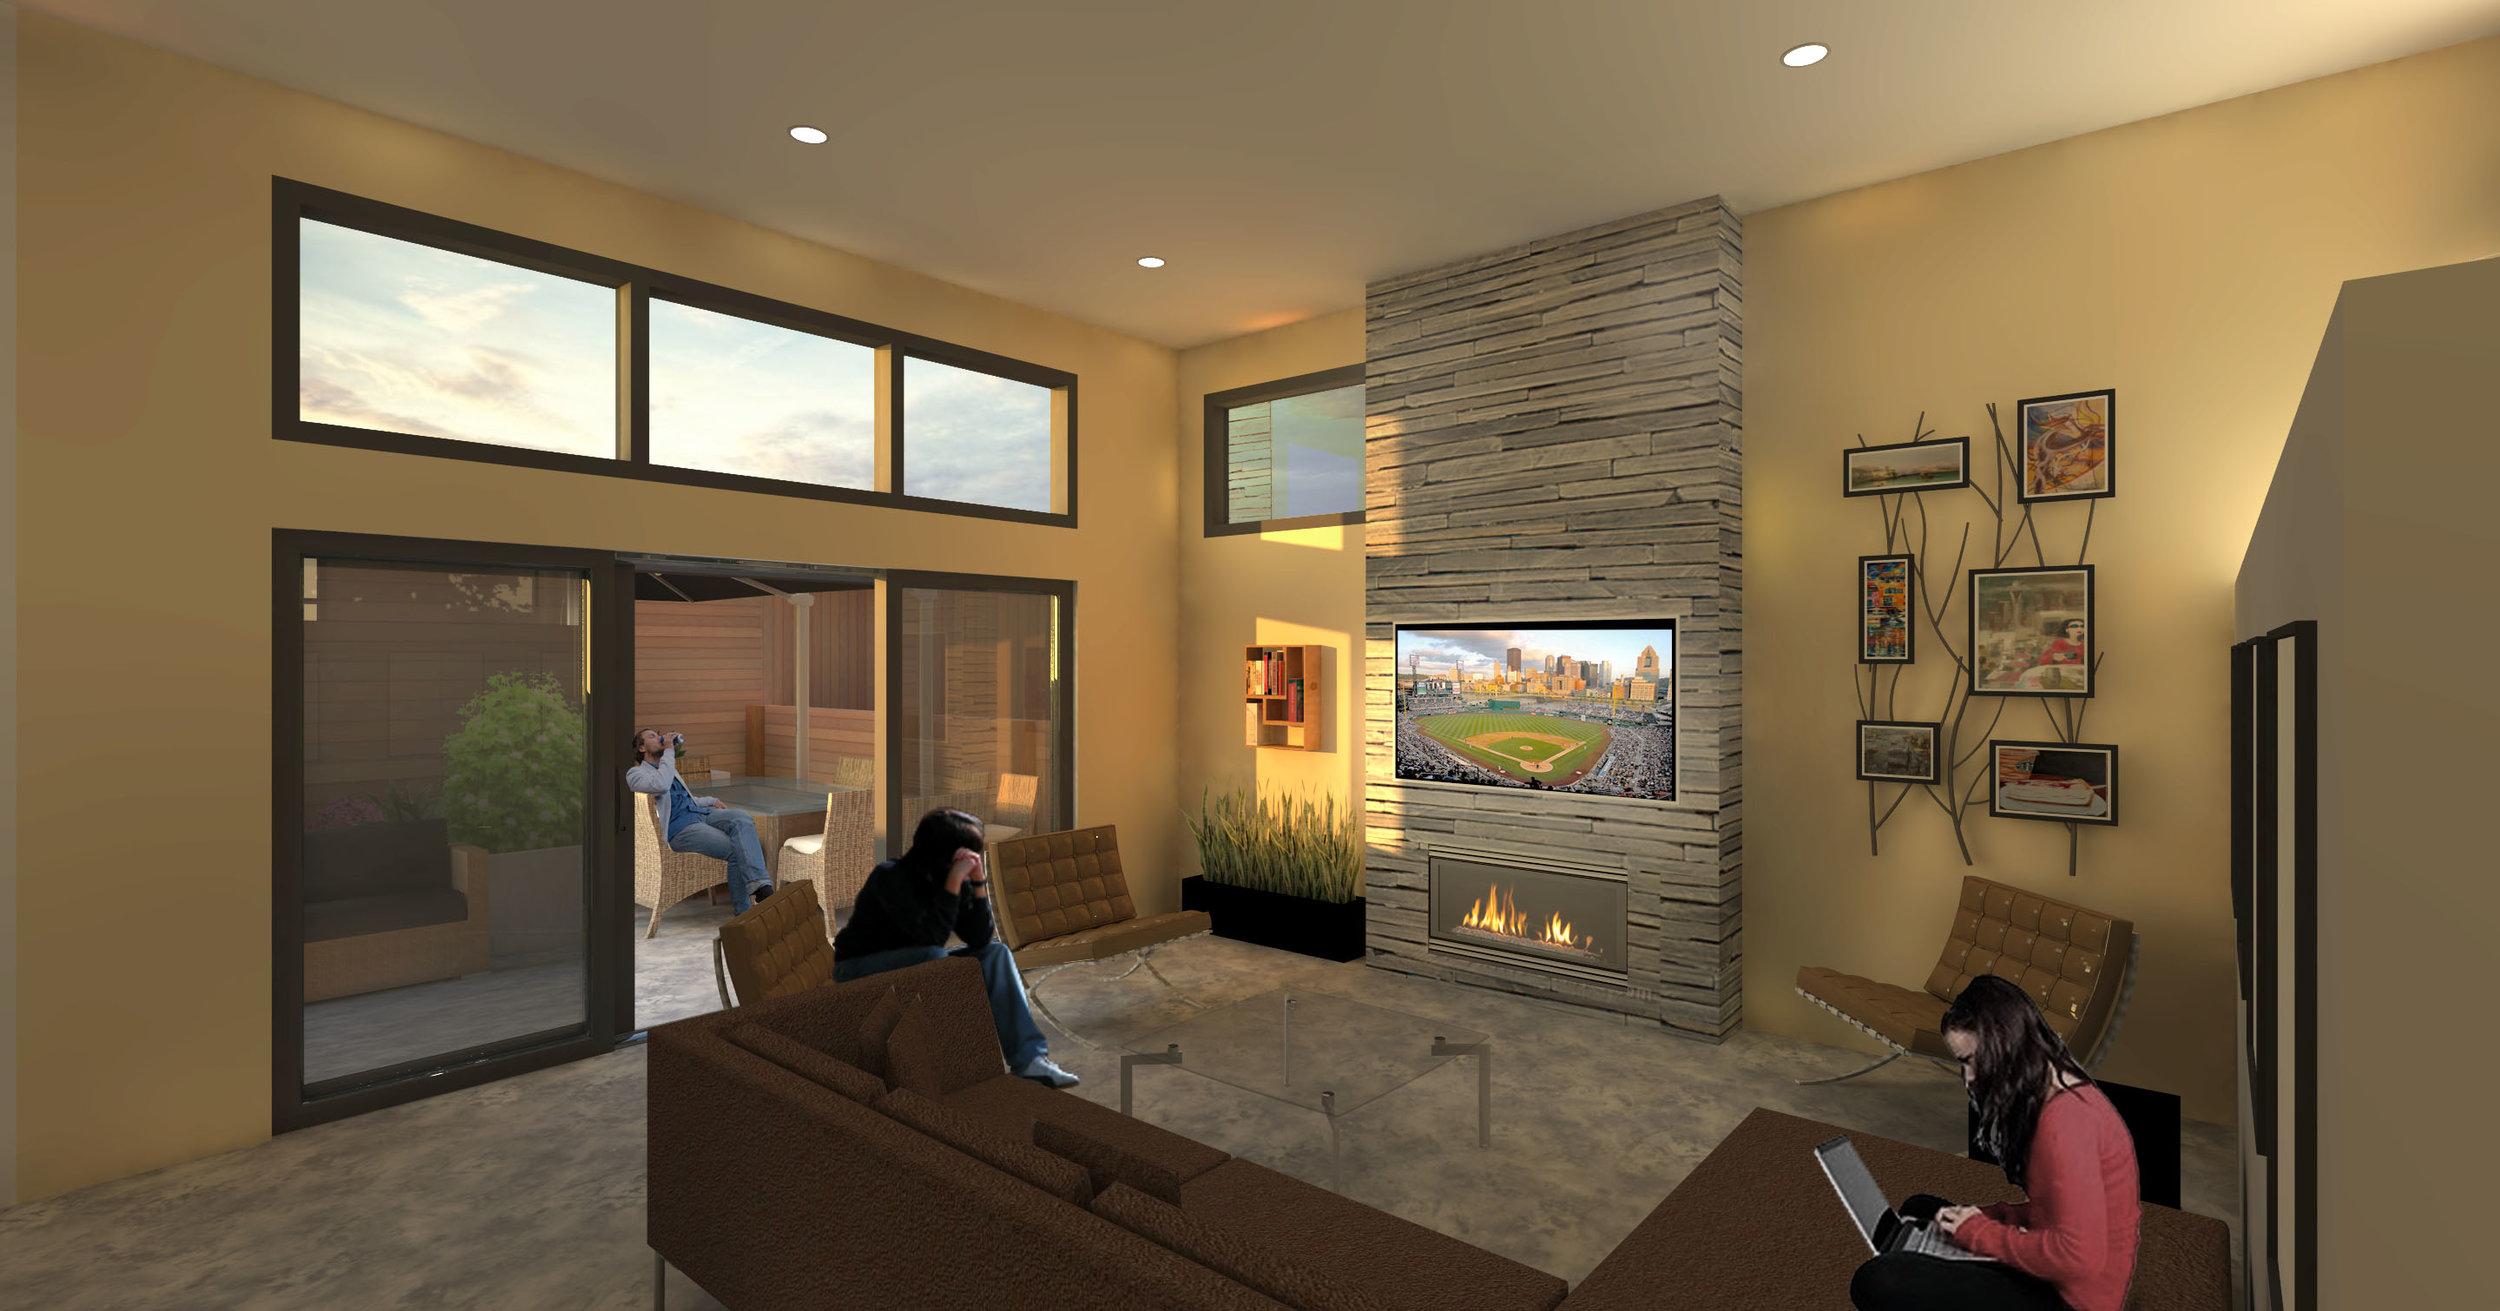 Euclid Ave interior rendering 2 family room.jpg